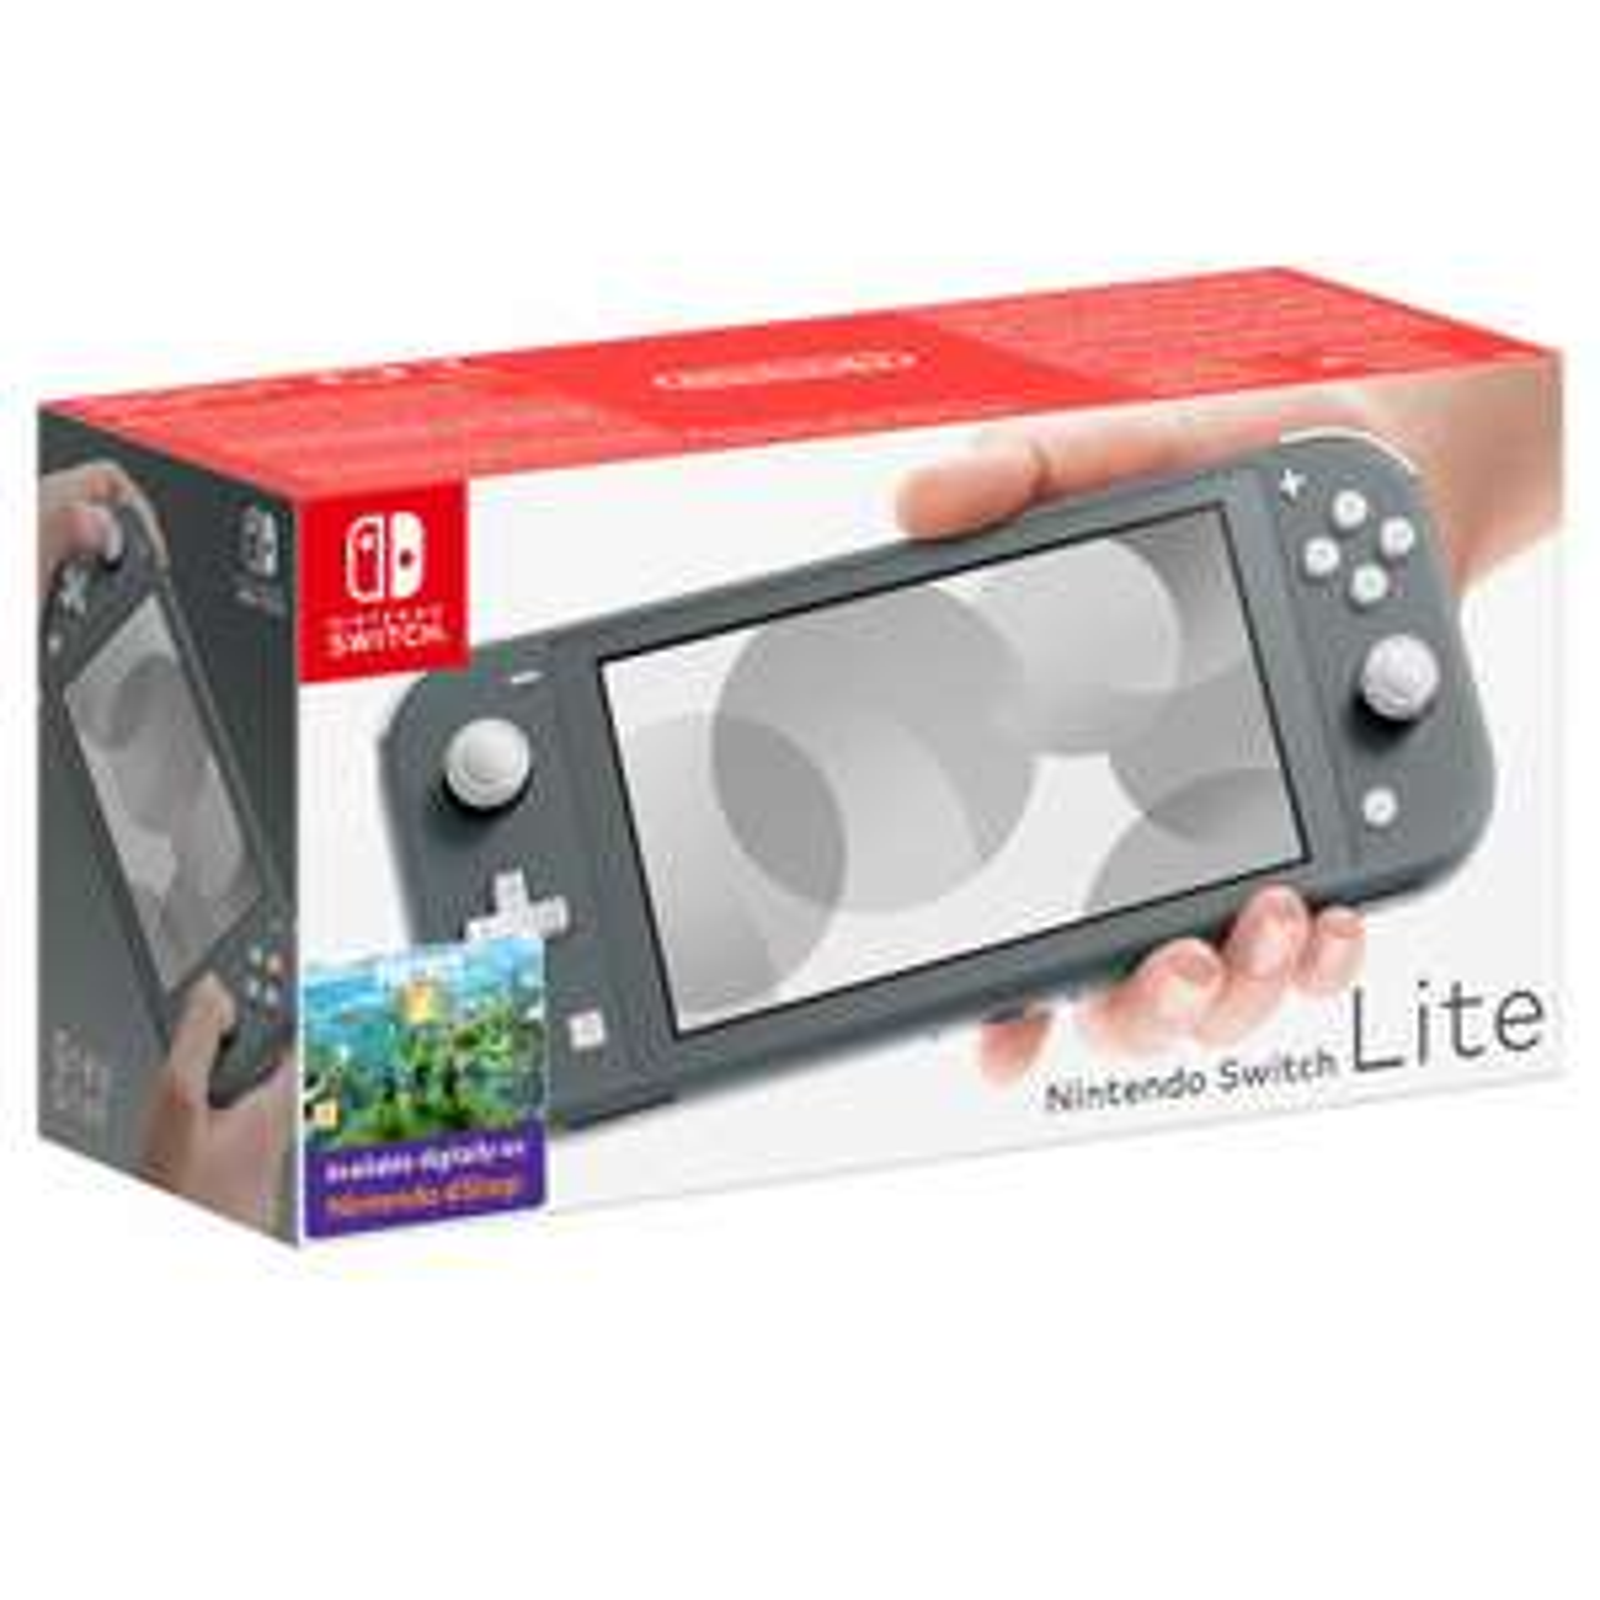 Nintendo Switch Lite (Grey) £199.99 at Nintendo Official UK Store